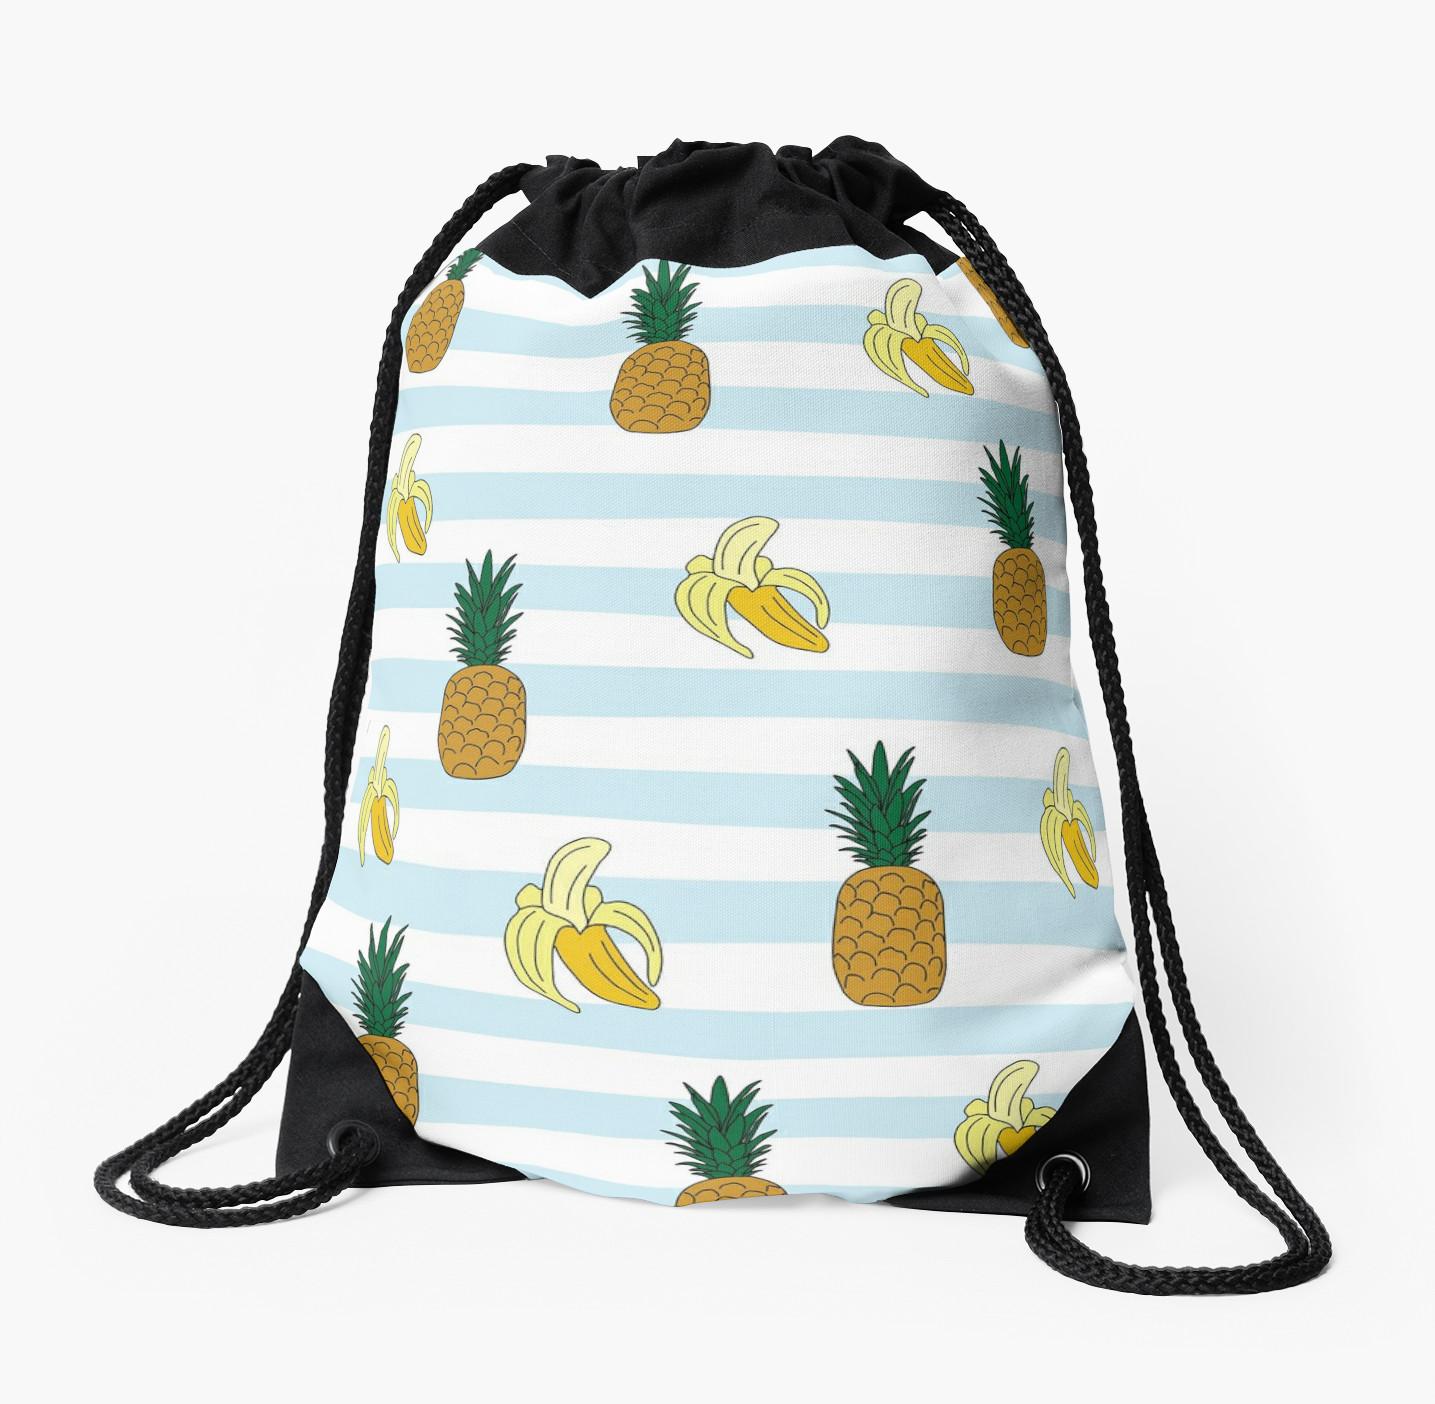 Culturedarm Bananas Pineapples Drawstring Bag